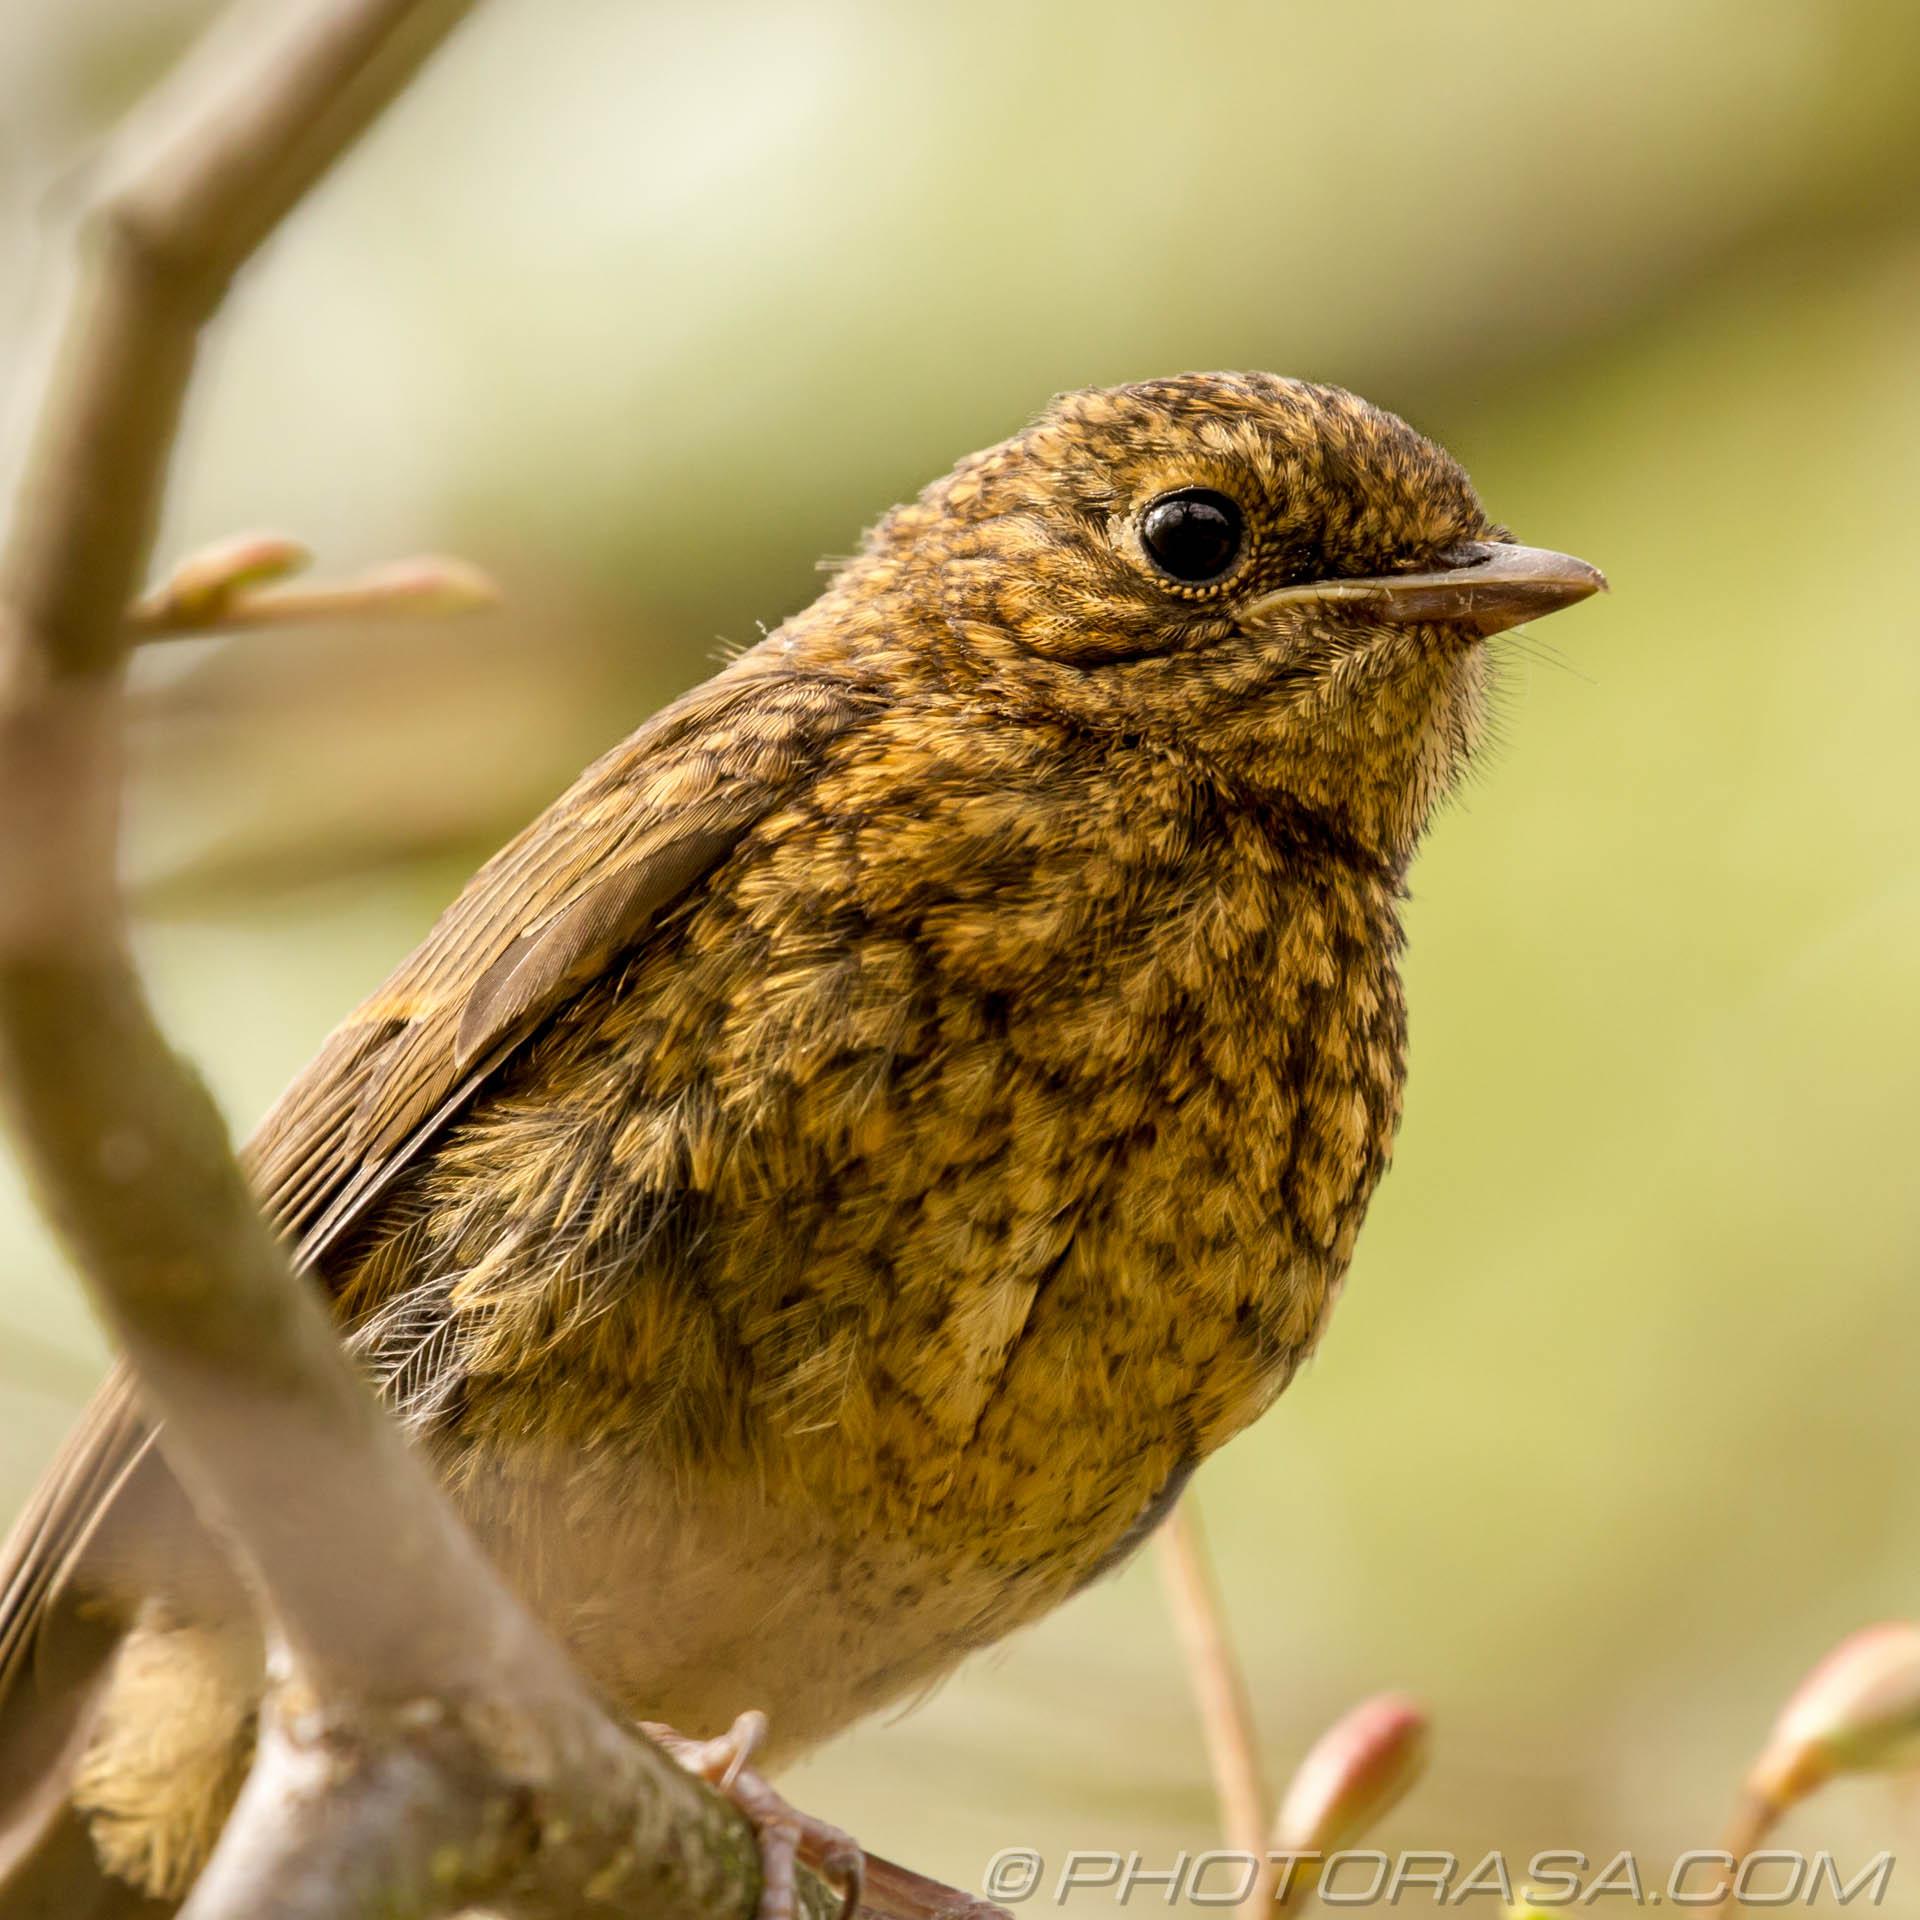 http://photorasa.com/young-robin-brown-orange/juvenile-robin/